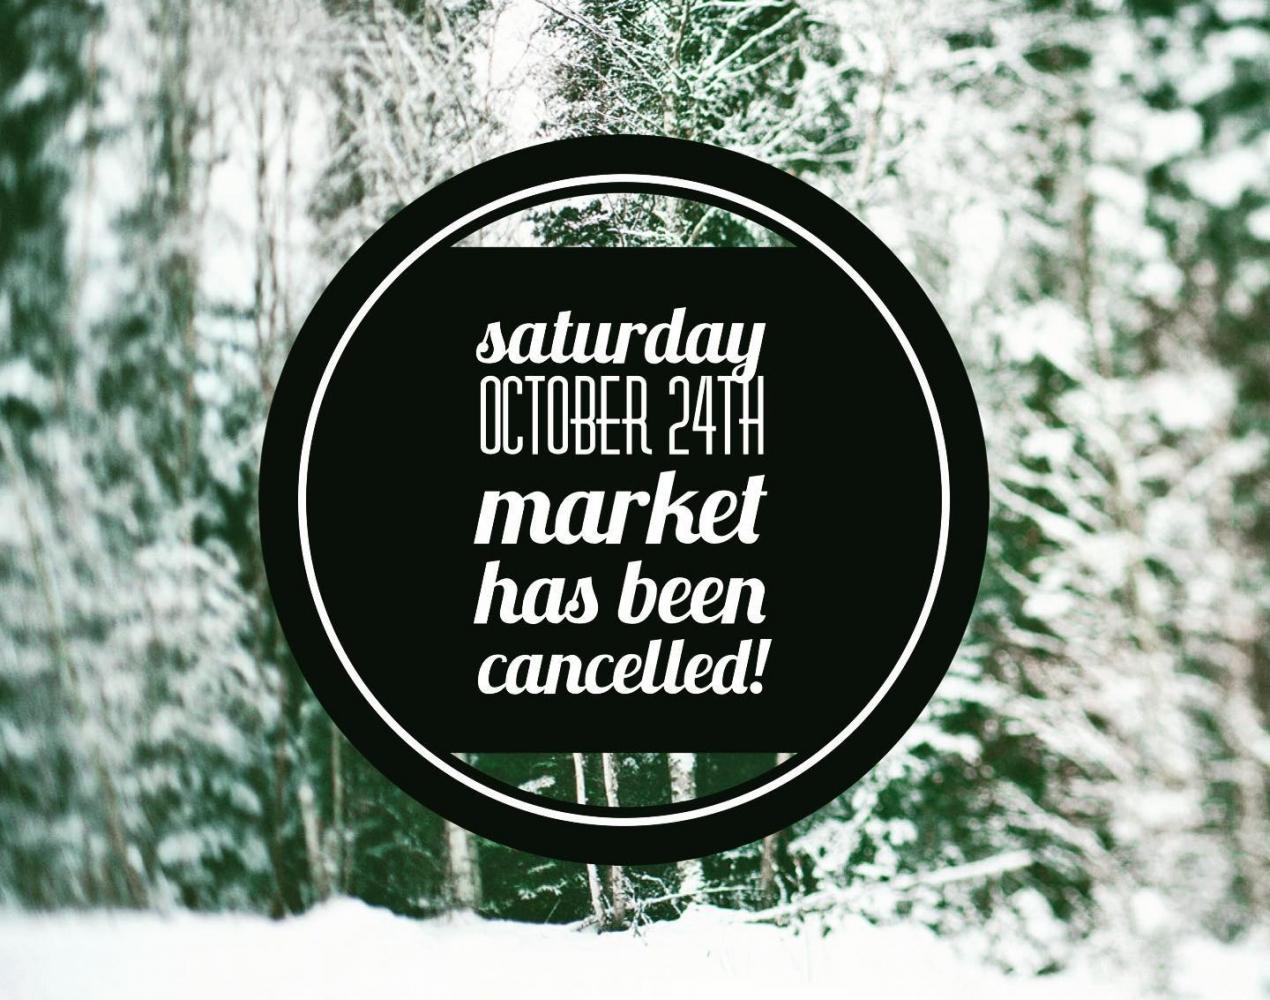 Oct. 24 Market Cancelled